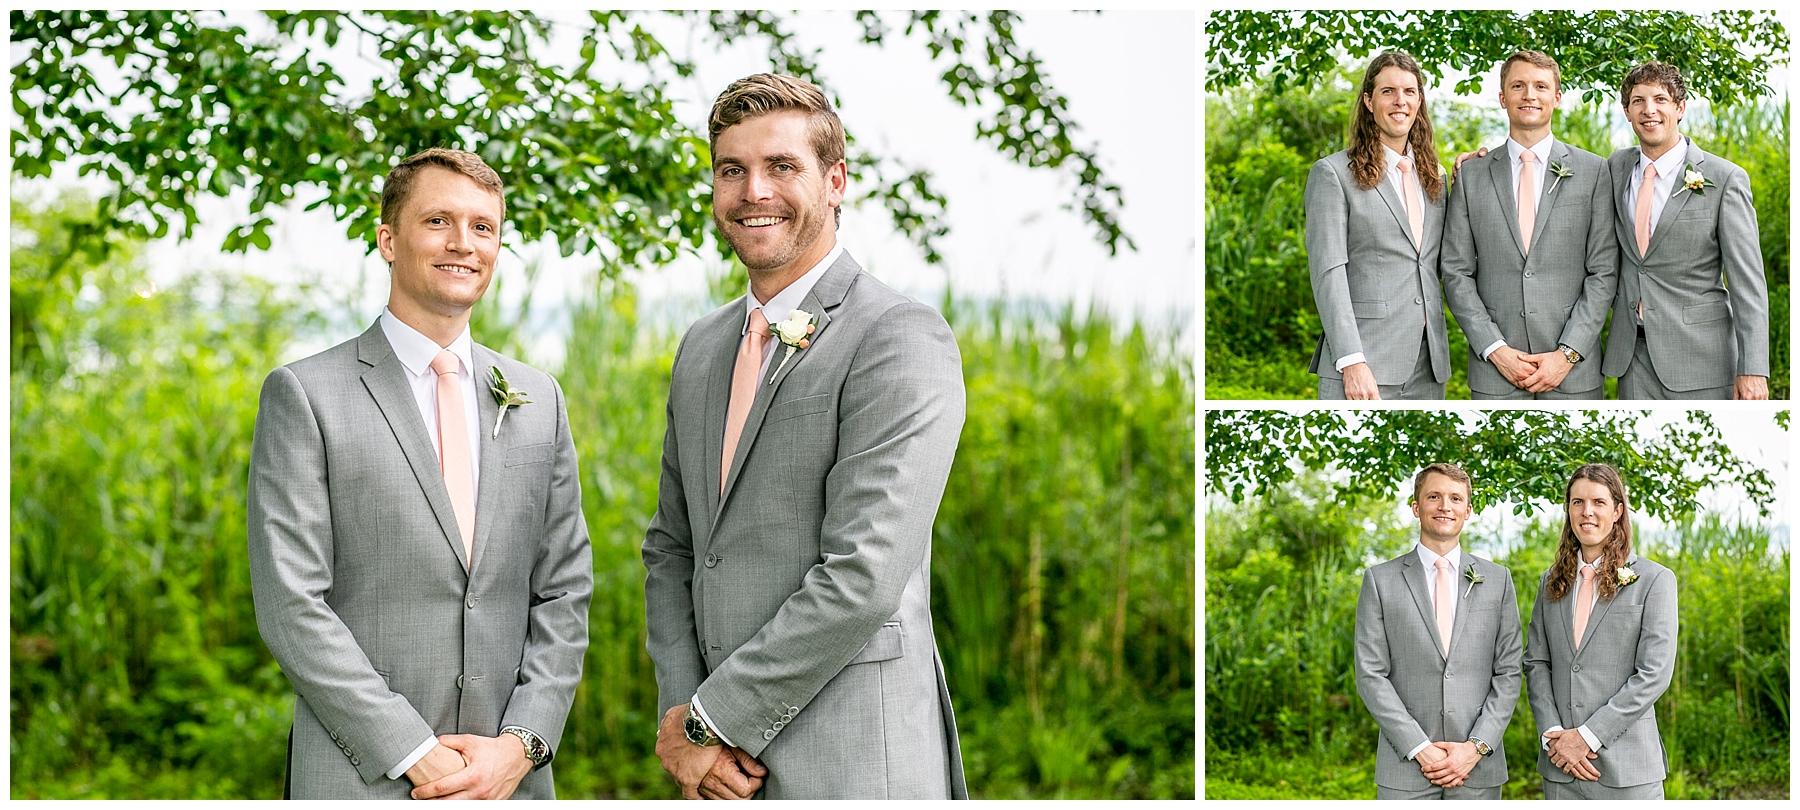 Chelsea Phil Bohemia River Overlook Wedding Living Radiant Photography photos_0074.jpg